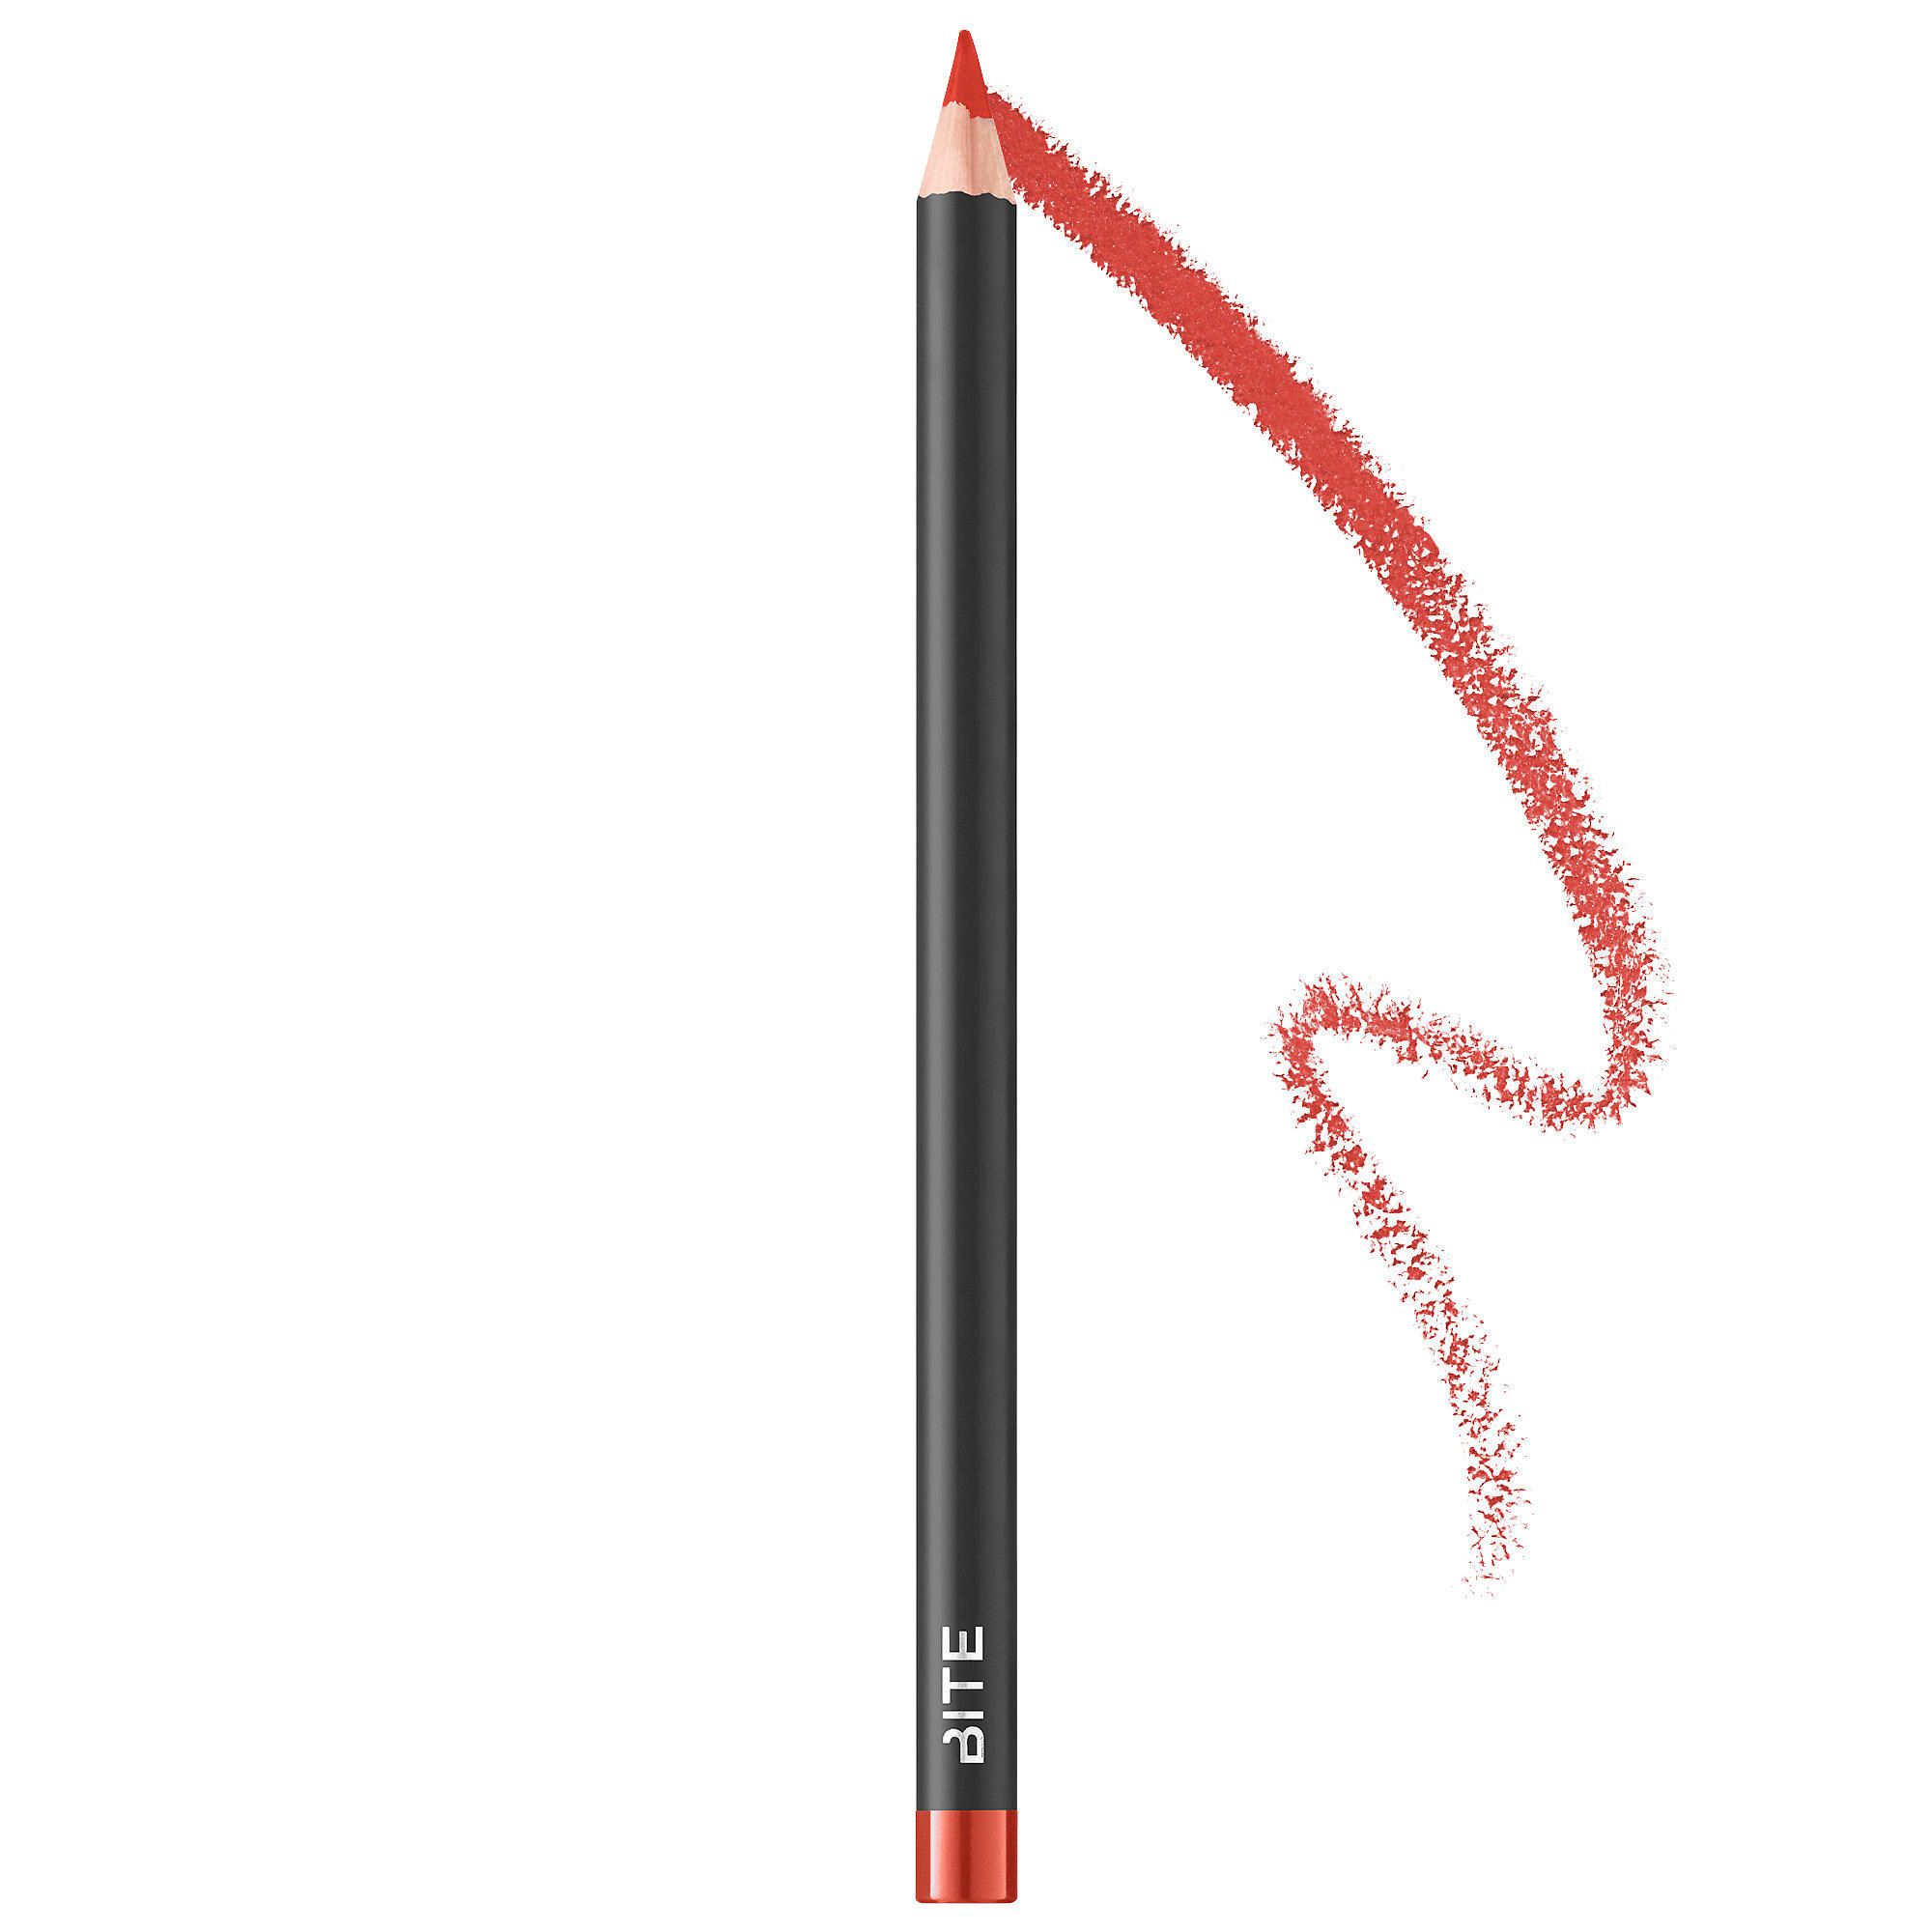 Bite Beauty The Lip Pencil Deep Orange-Red 076